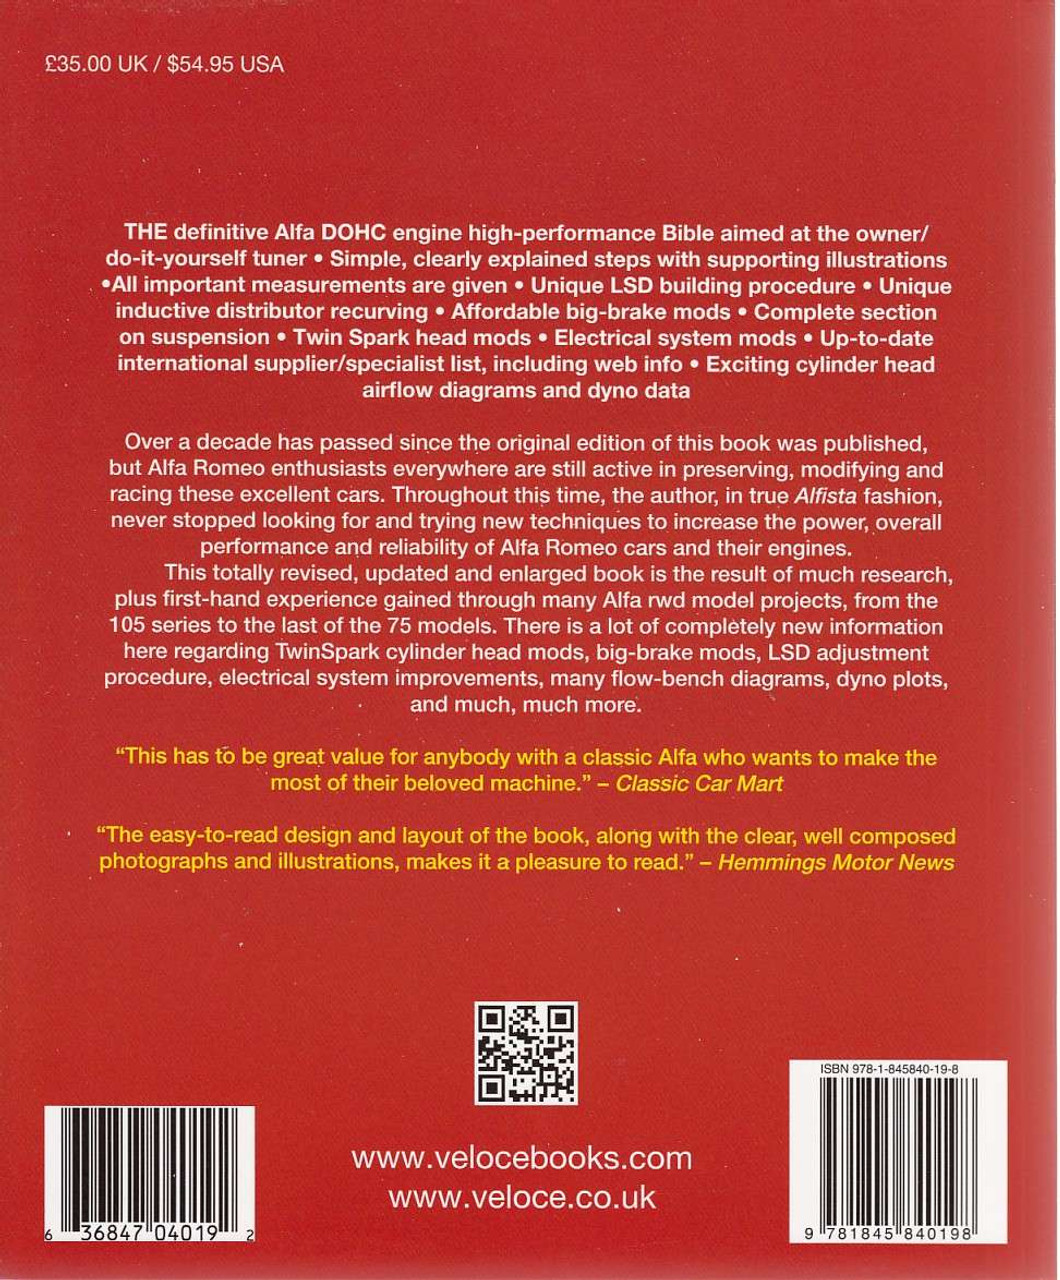 ... The Alfa Romeo DOHC Engine High-Performance Manual Back Cover